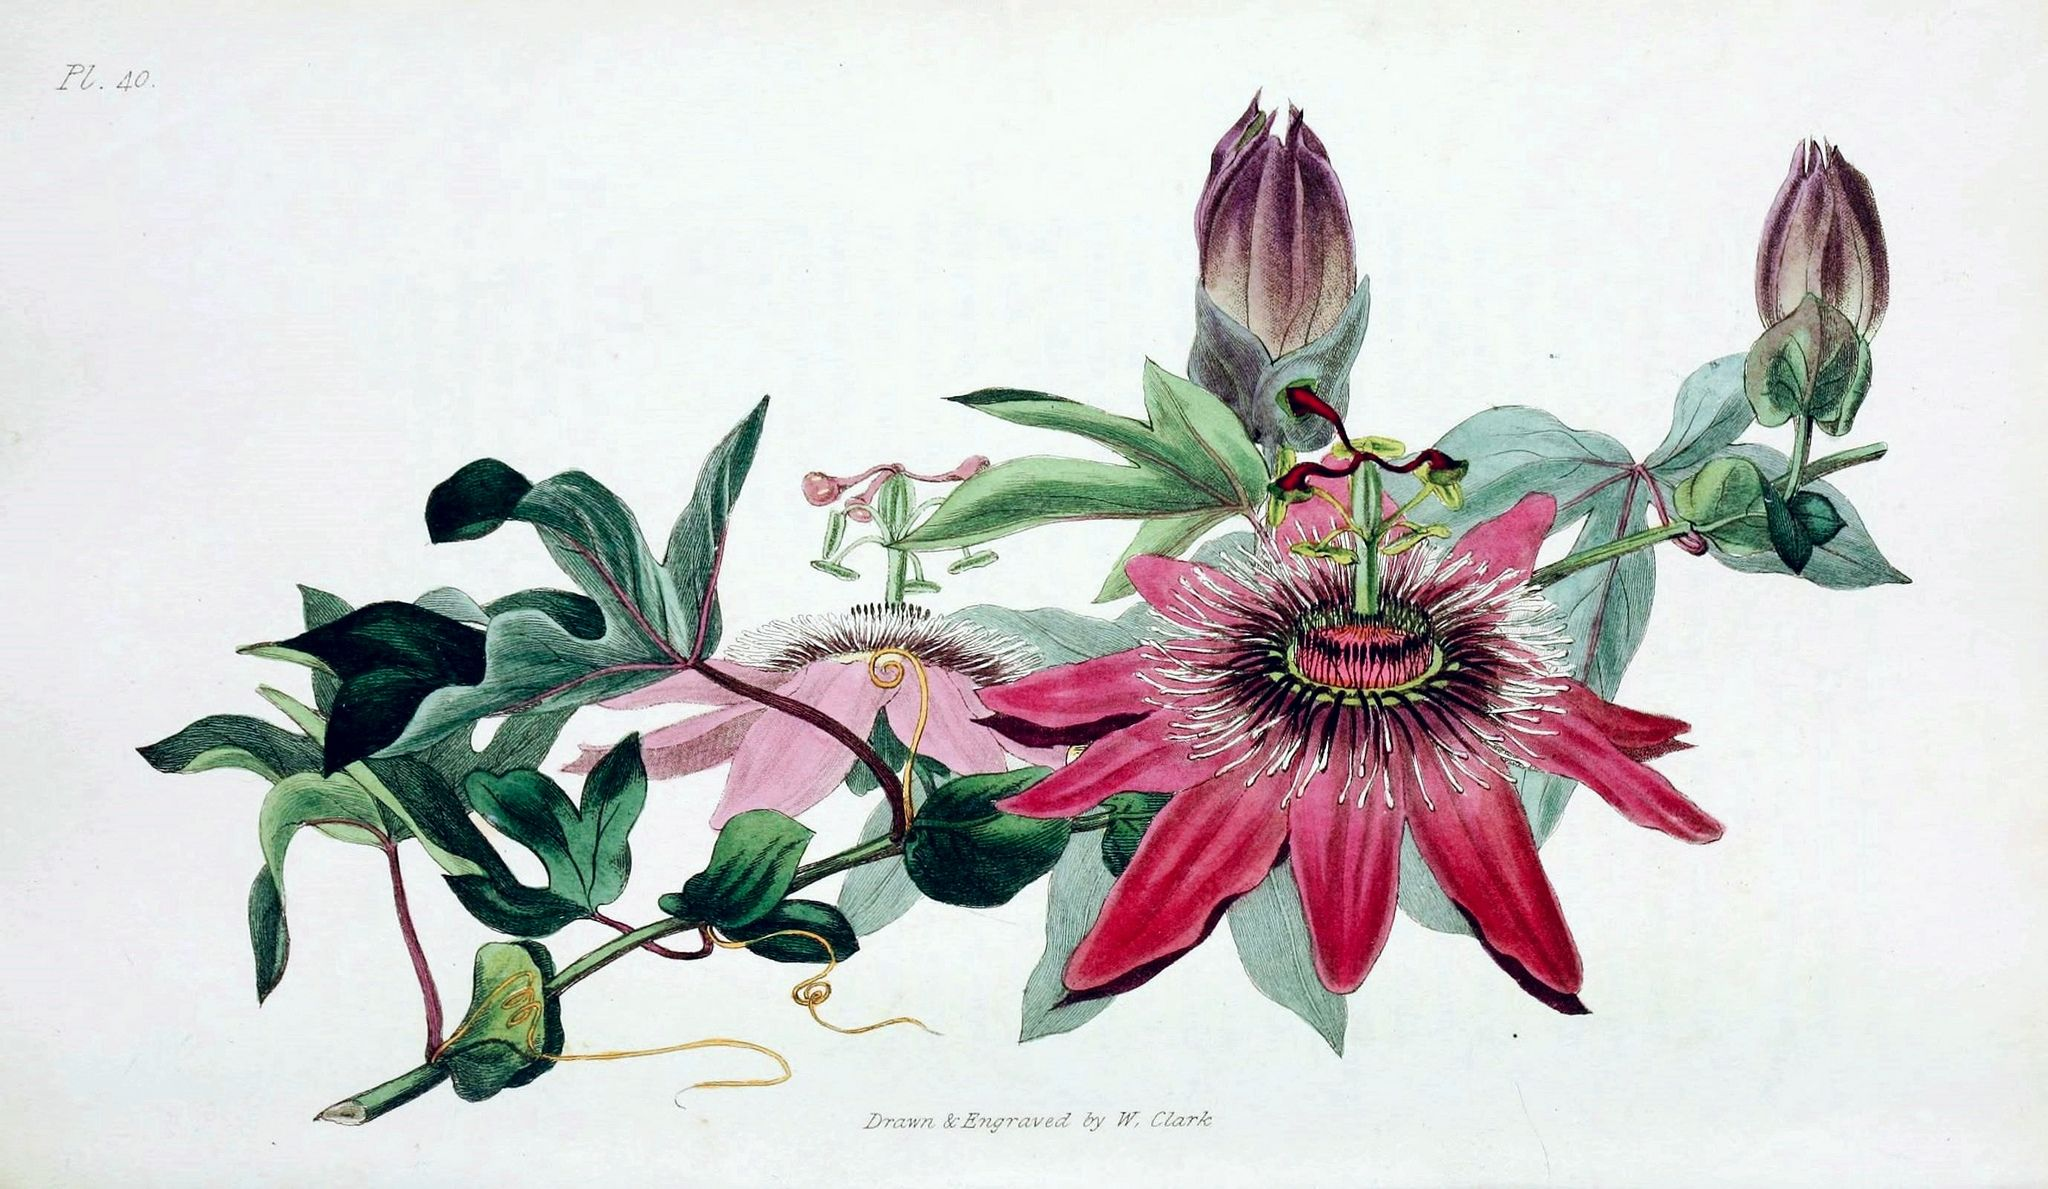 Passiflora Caerulea X Racemosa Cv Racemosa 1826 Passiflora Caerulea Passion Flower Passiflora